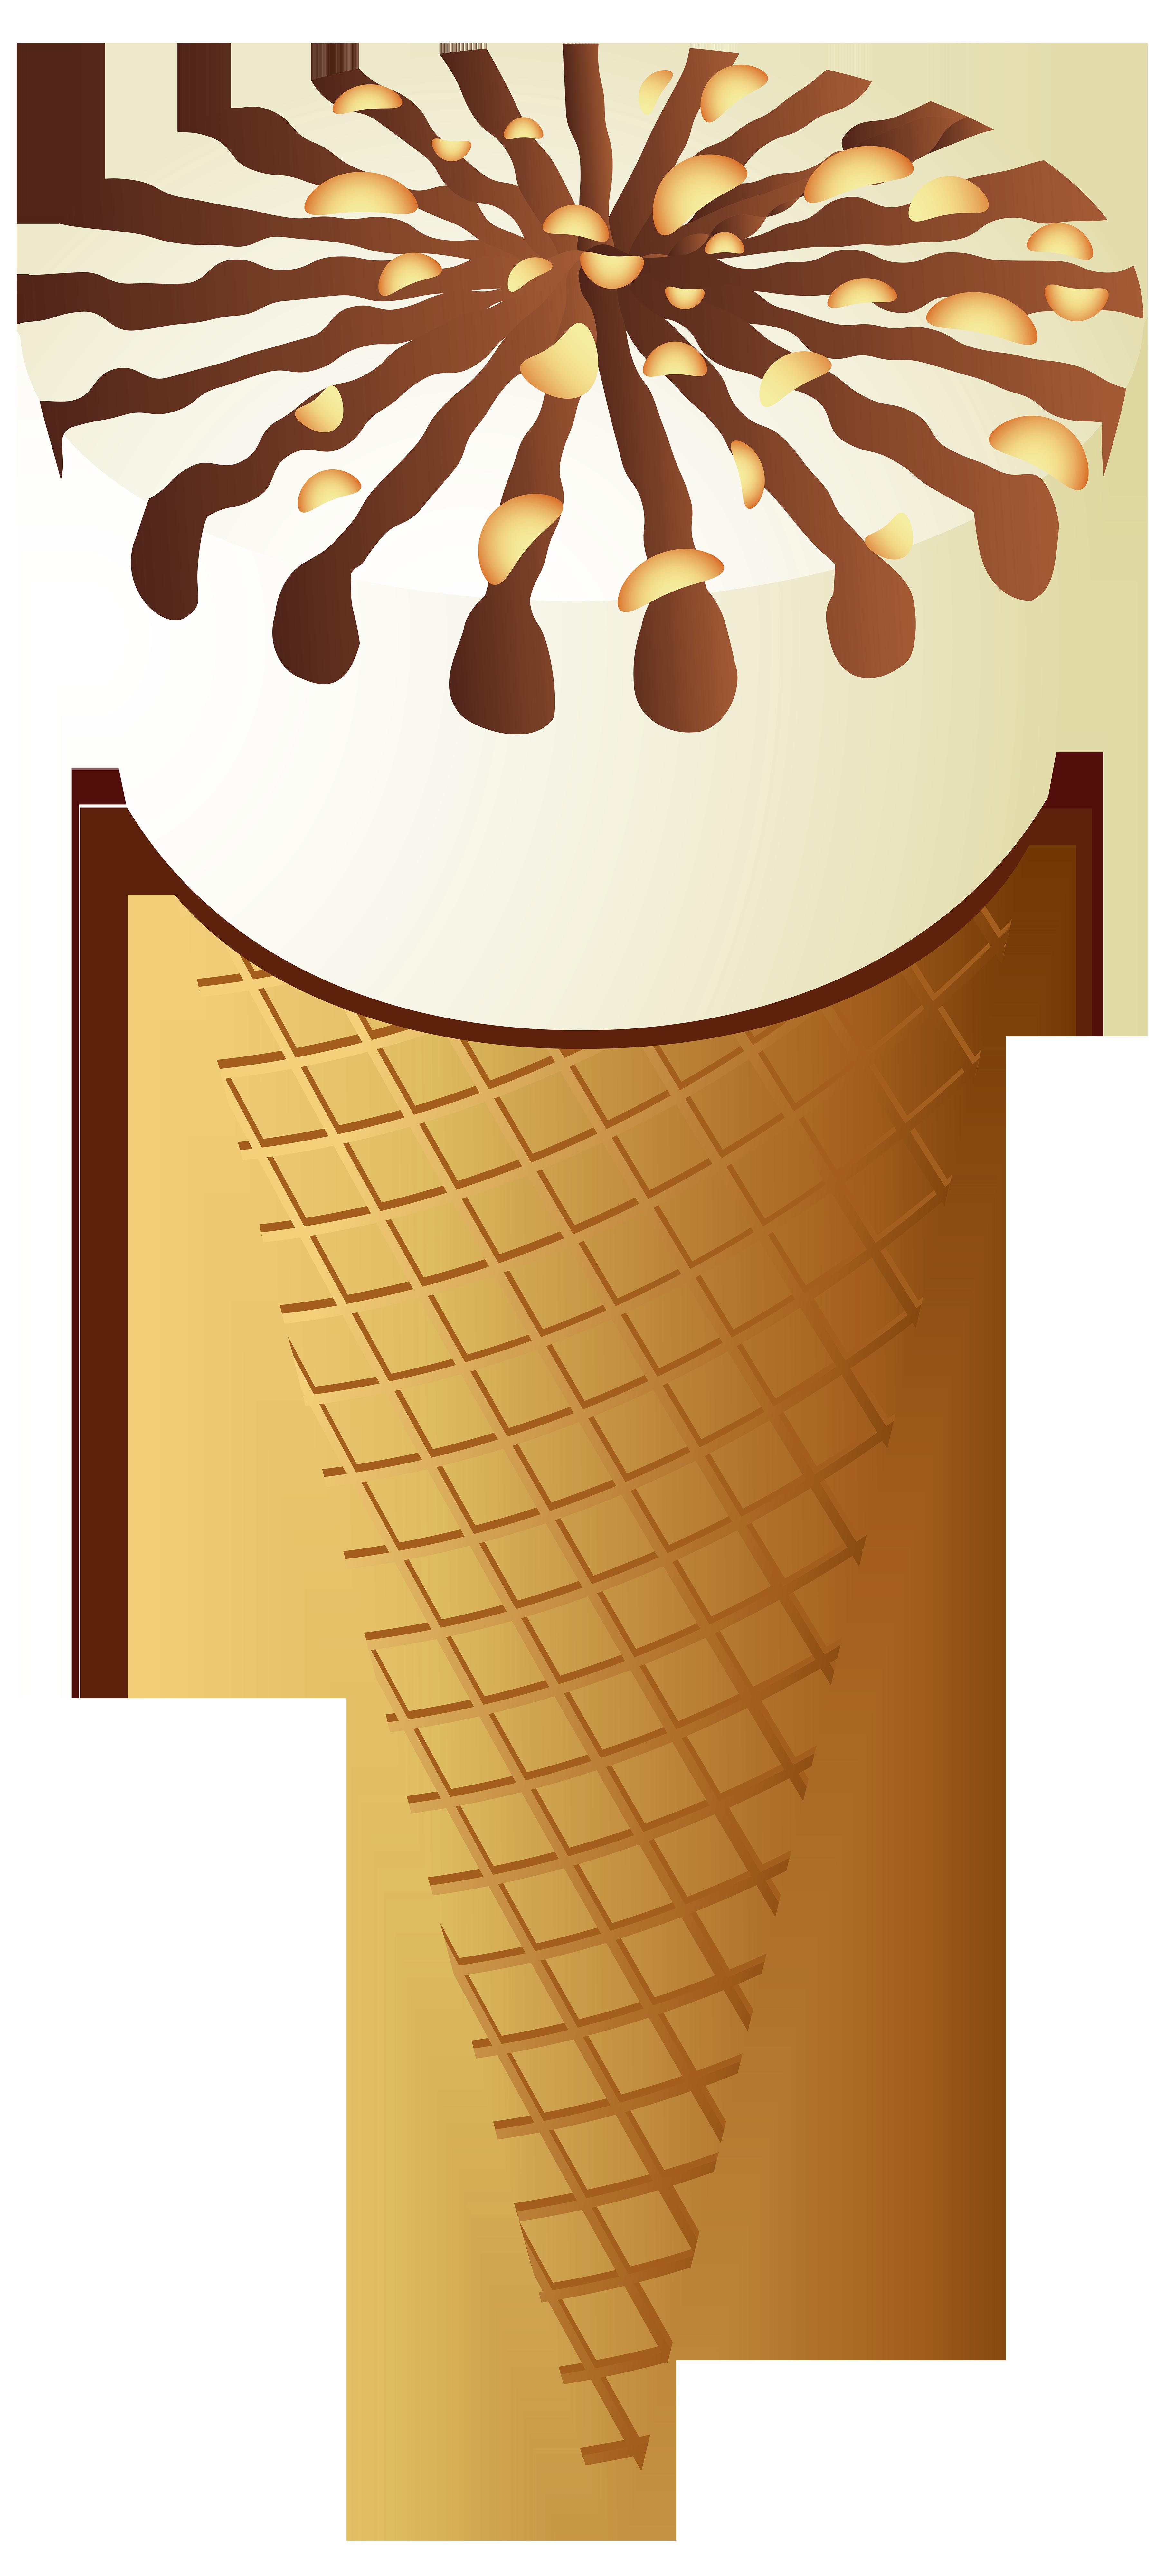 Ice cream cone without ice cream clipart vector transparent download Ice cream cone ice clip art image 9 - ClipartBarn vector transparent download